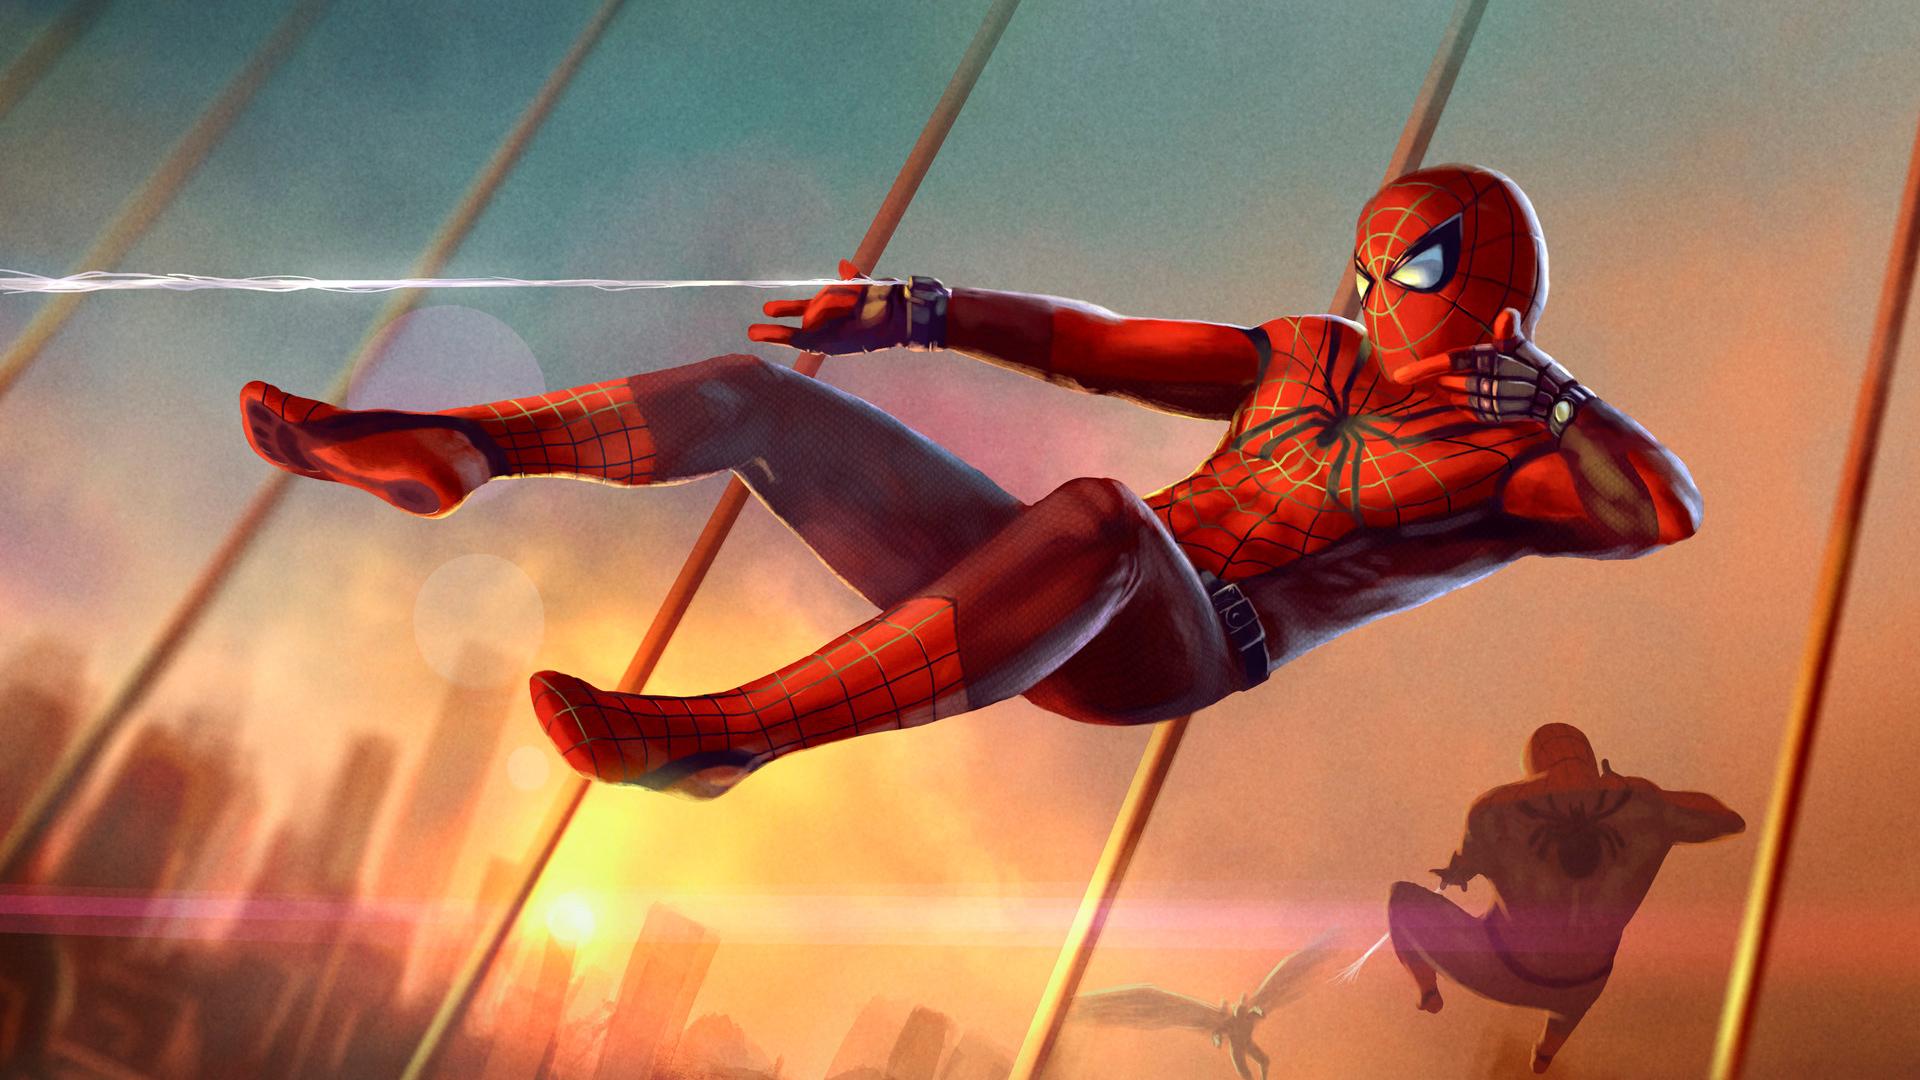 10 Best Spider Man 2099 Wallpaper Hd Full Hd 1920 1080 For: Spider Man Artwork, Full HD Wallpaper